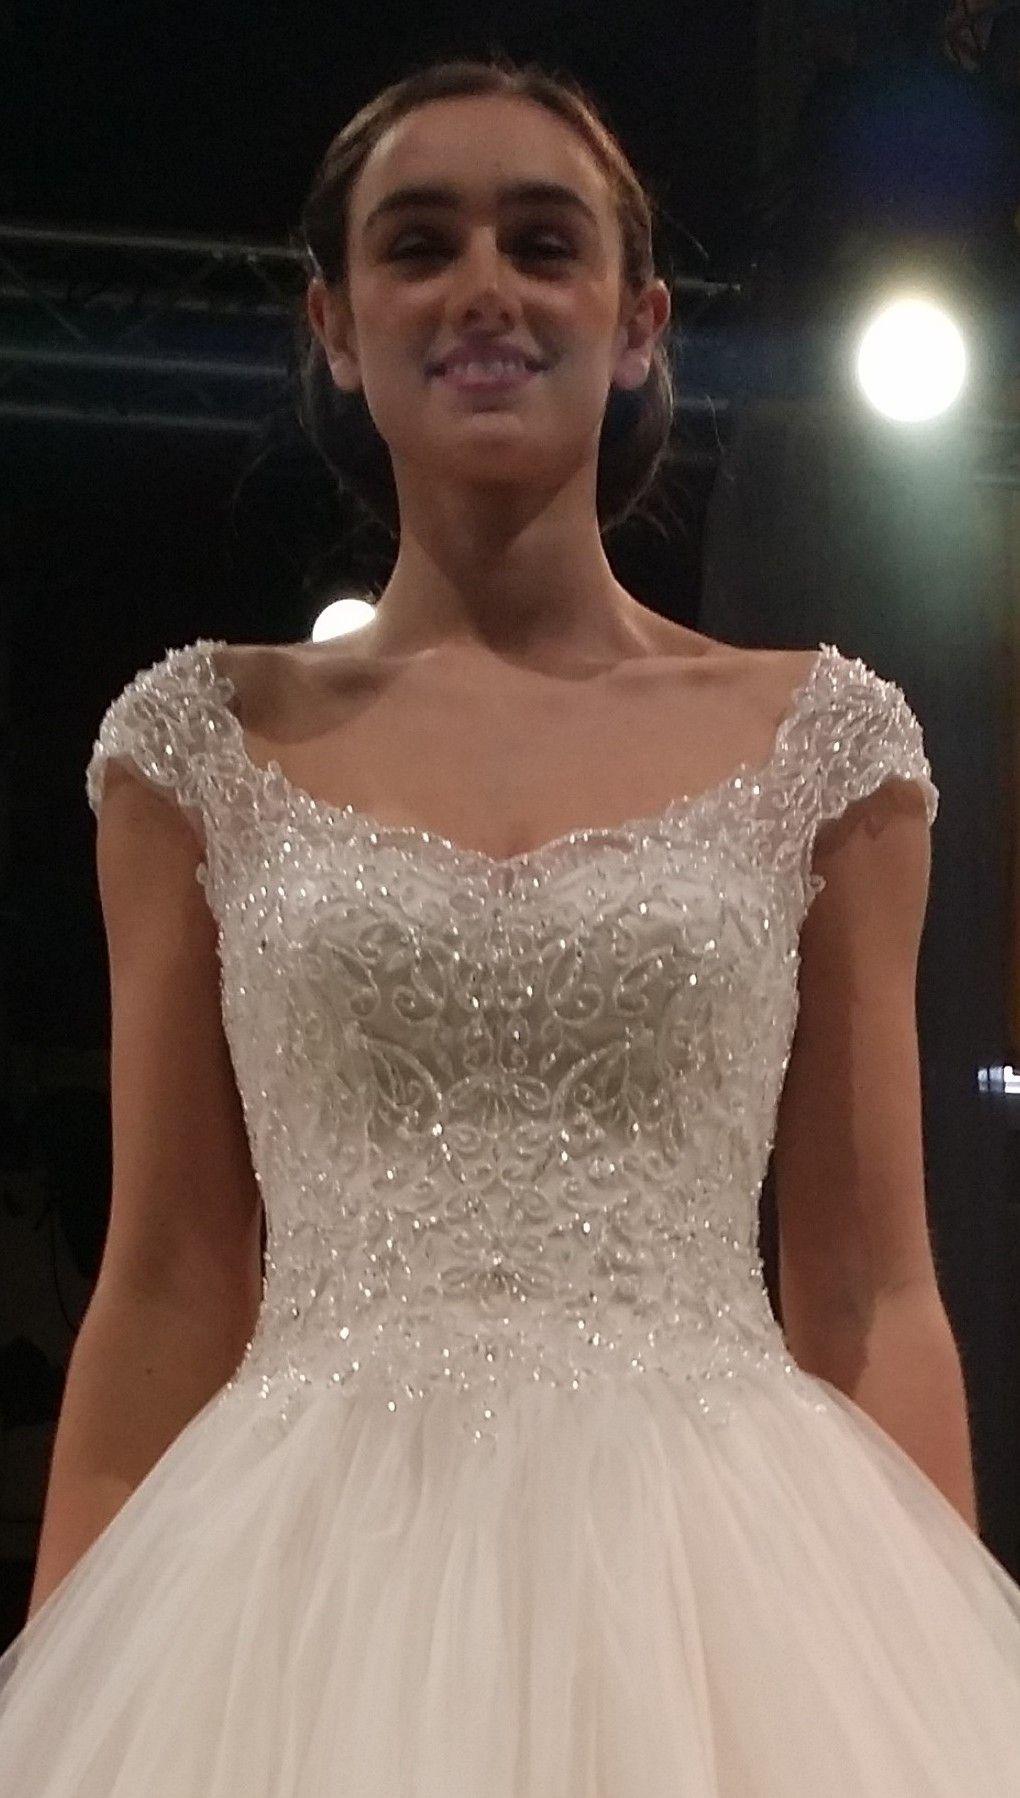 Maloree | Deb dress | Pinterest